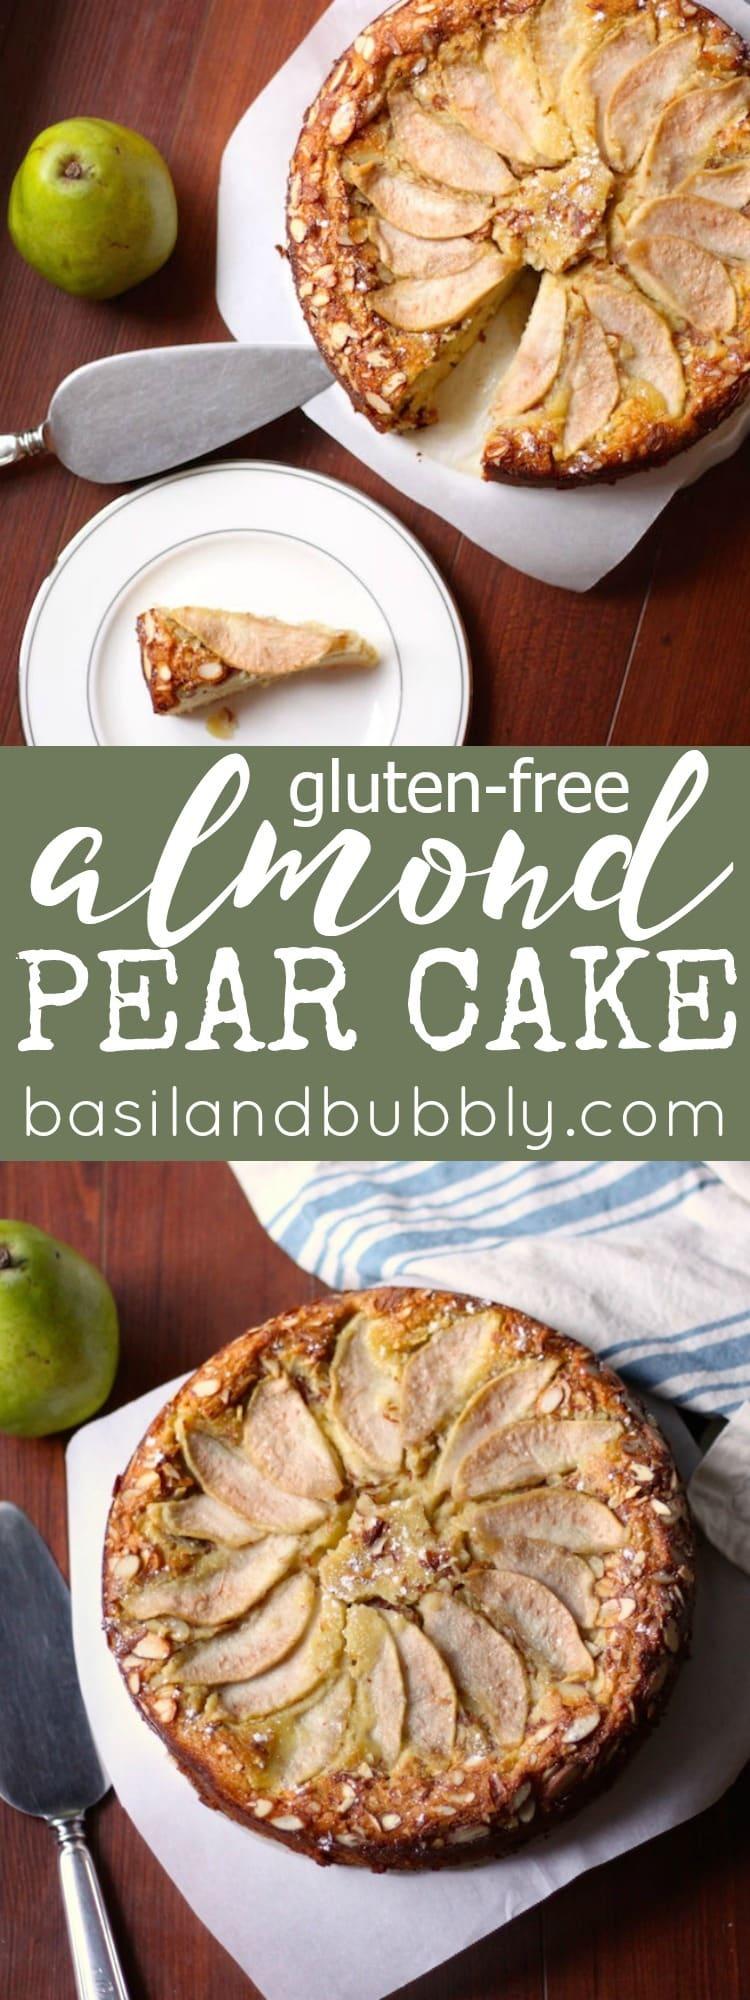 Gluten Free Almond Pear Cake